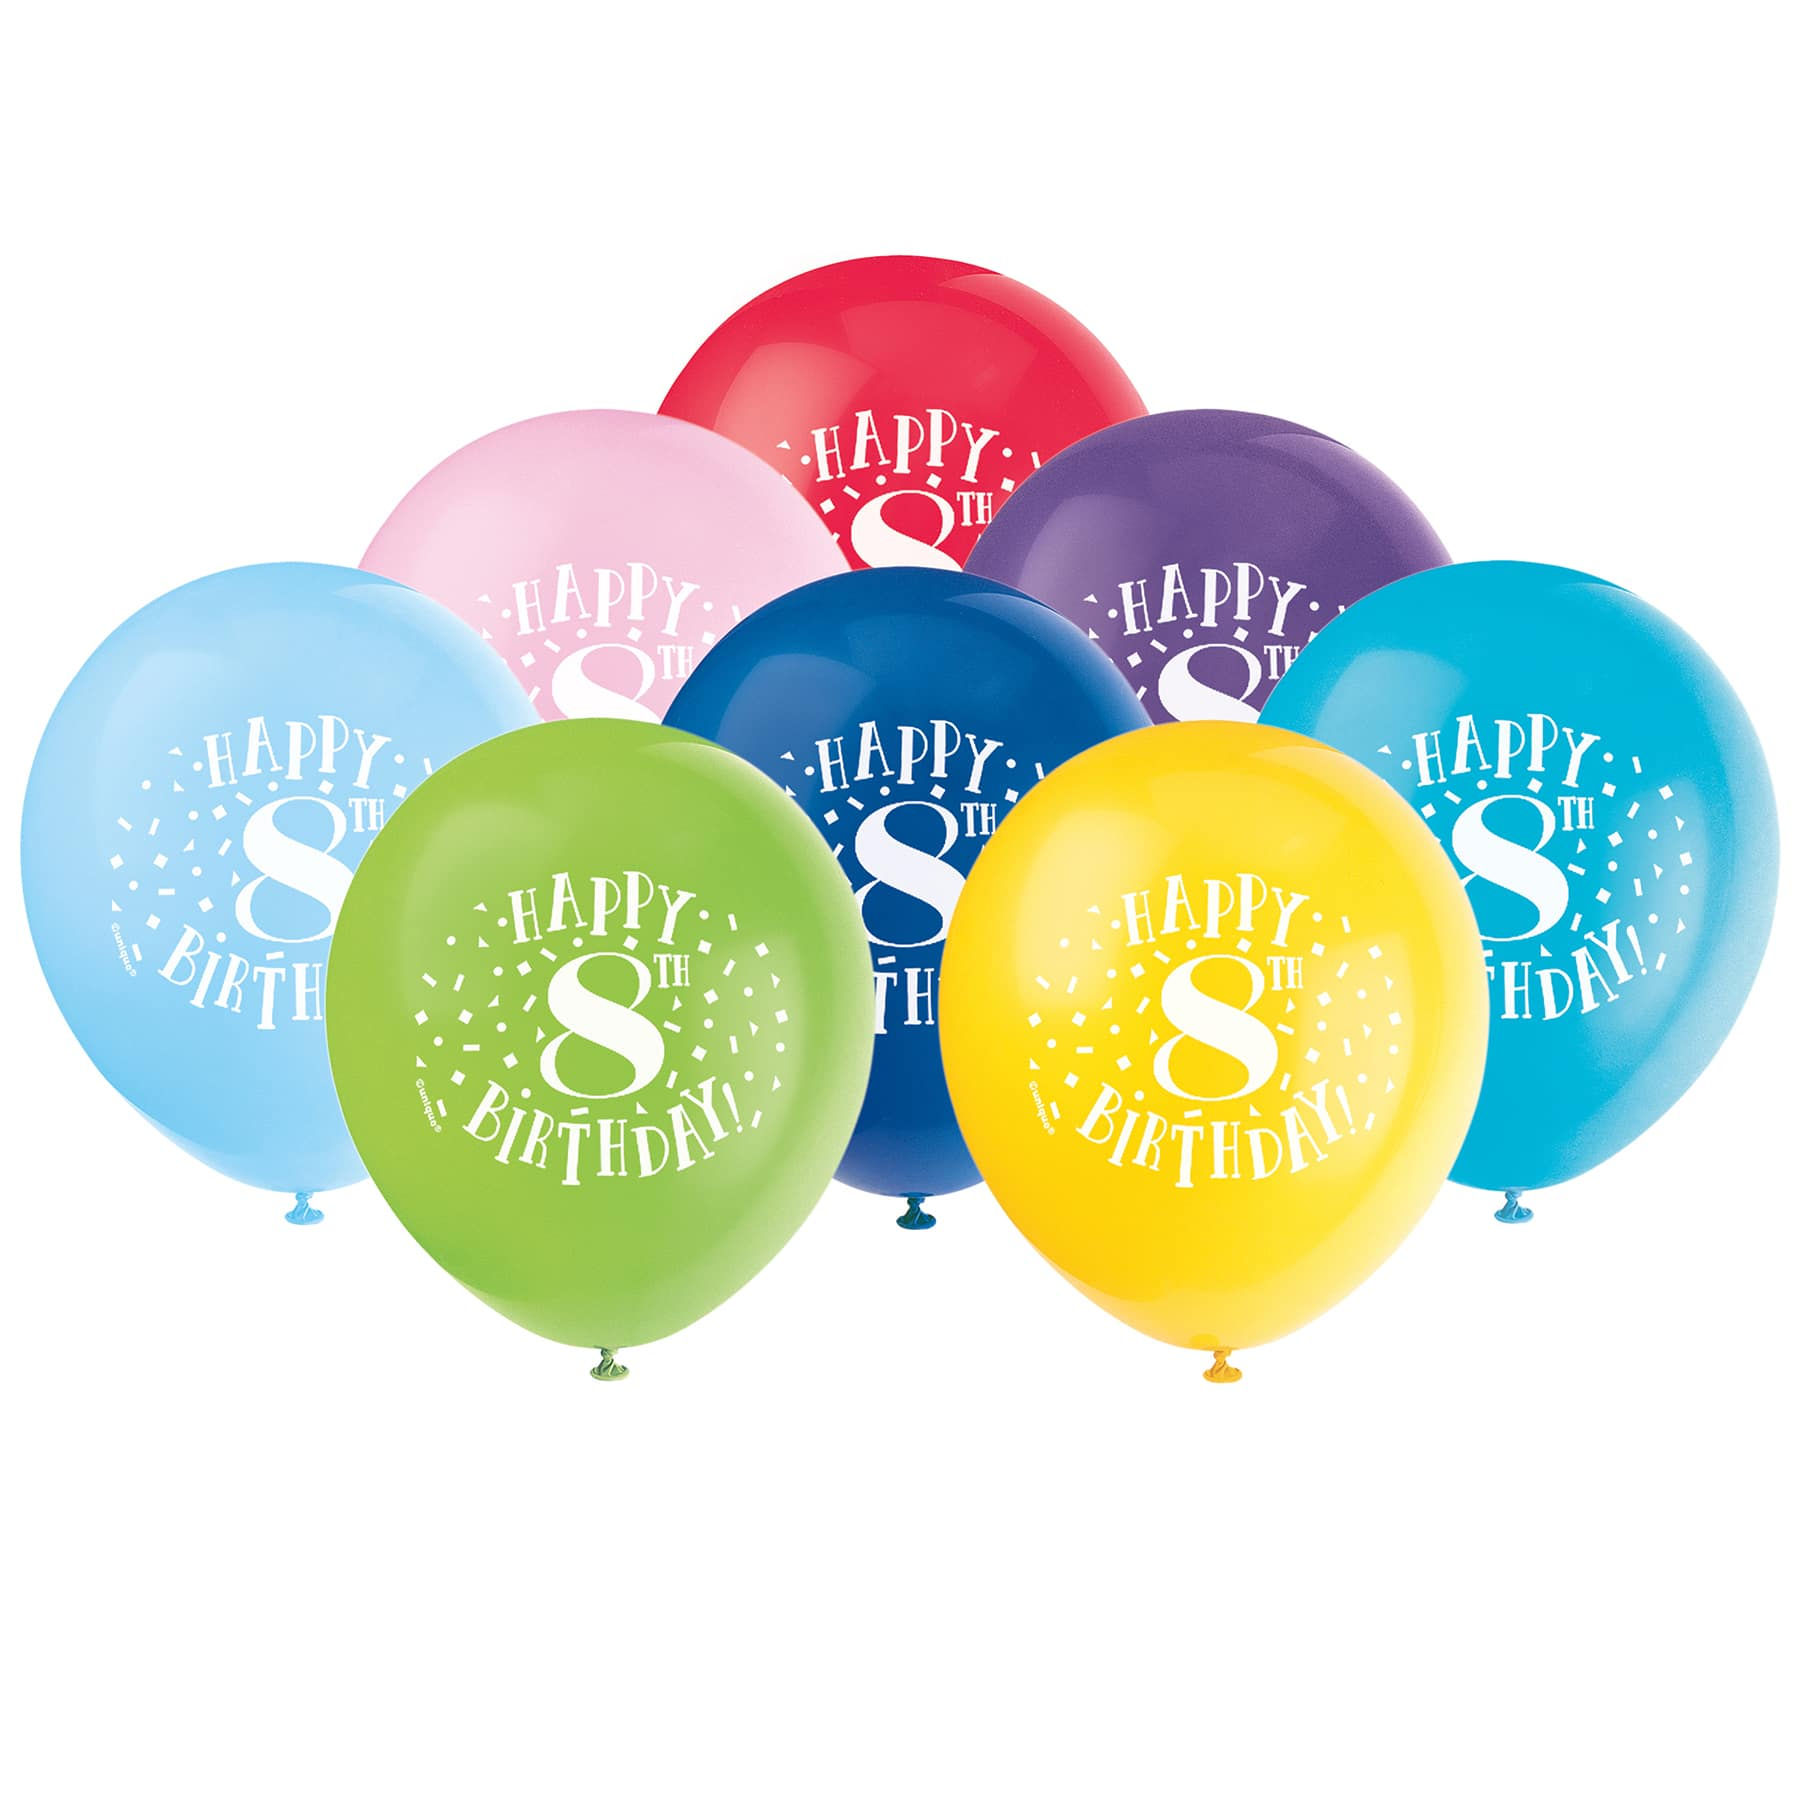 Happy 8th Birthday Balloons 8th Birthday Party Decorations